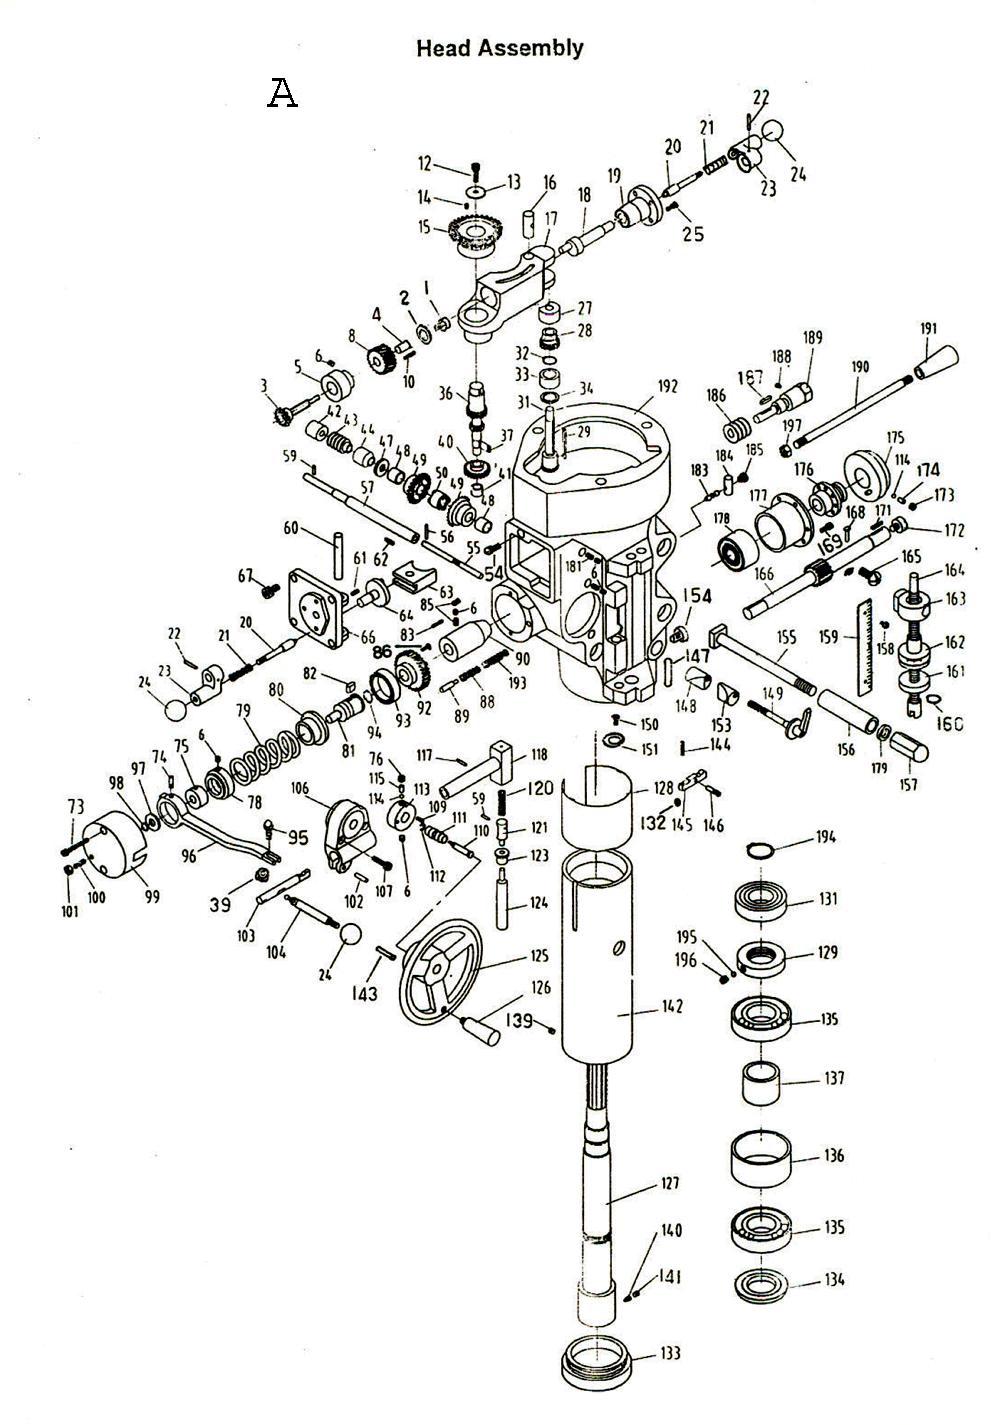 691205-jet-PB-1Break Down